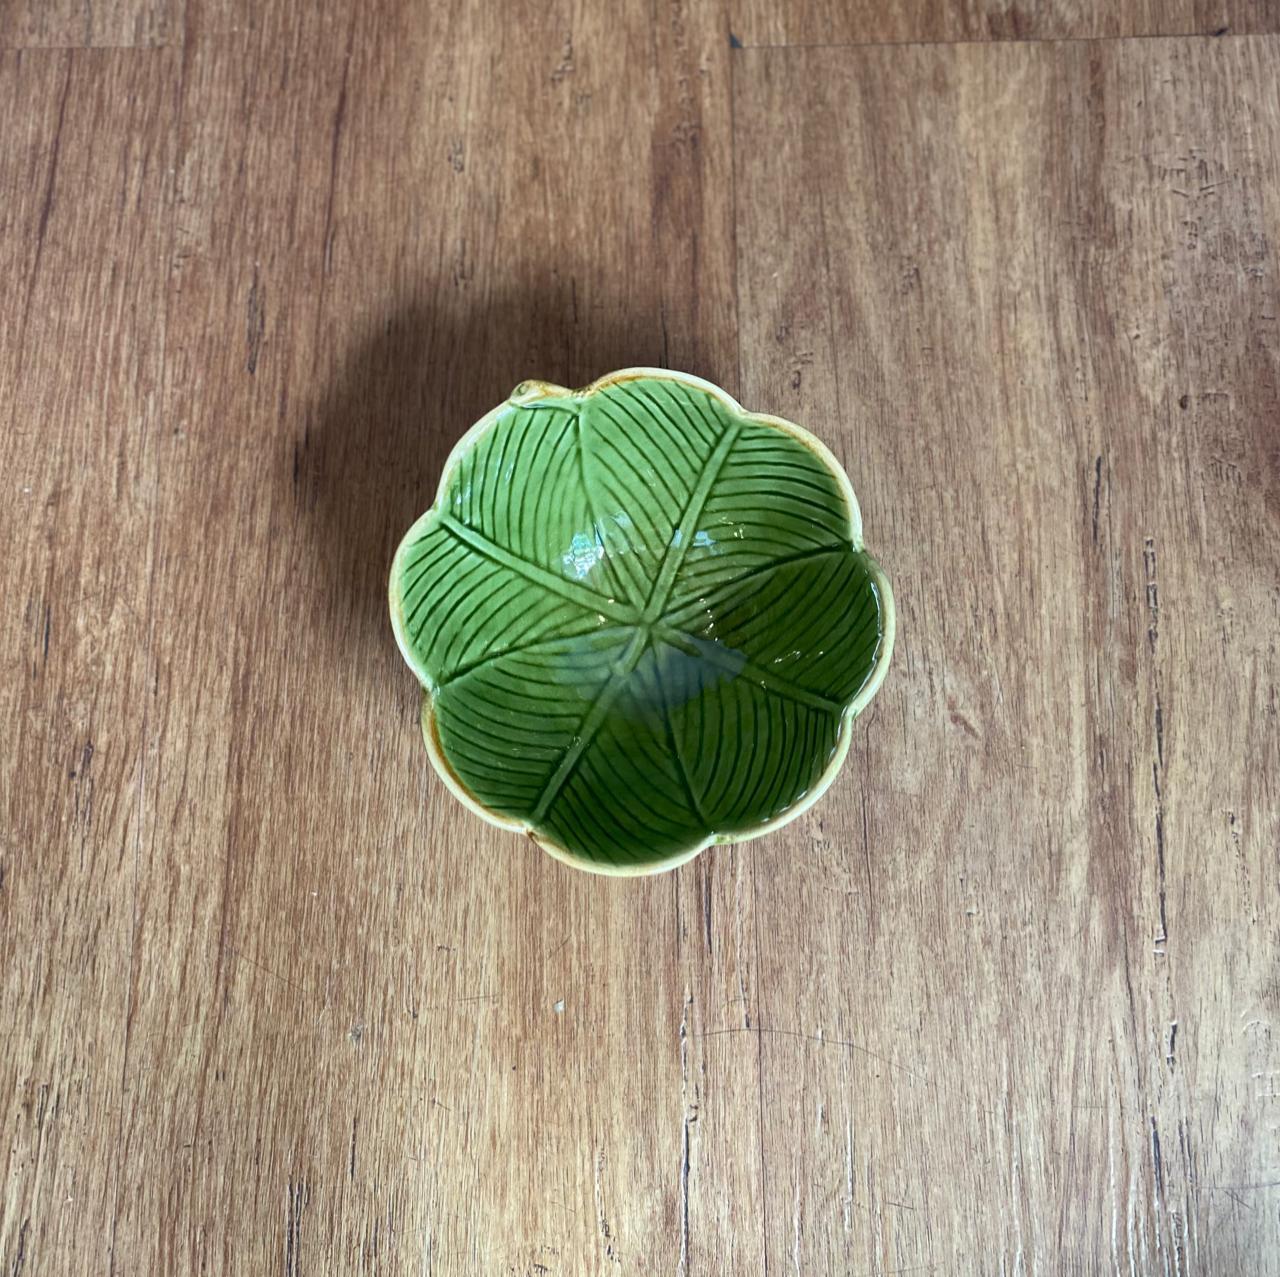 petisqueira folha